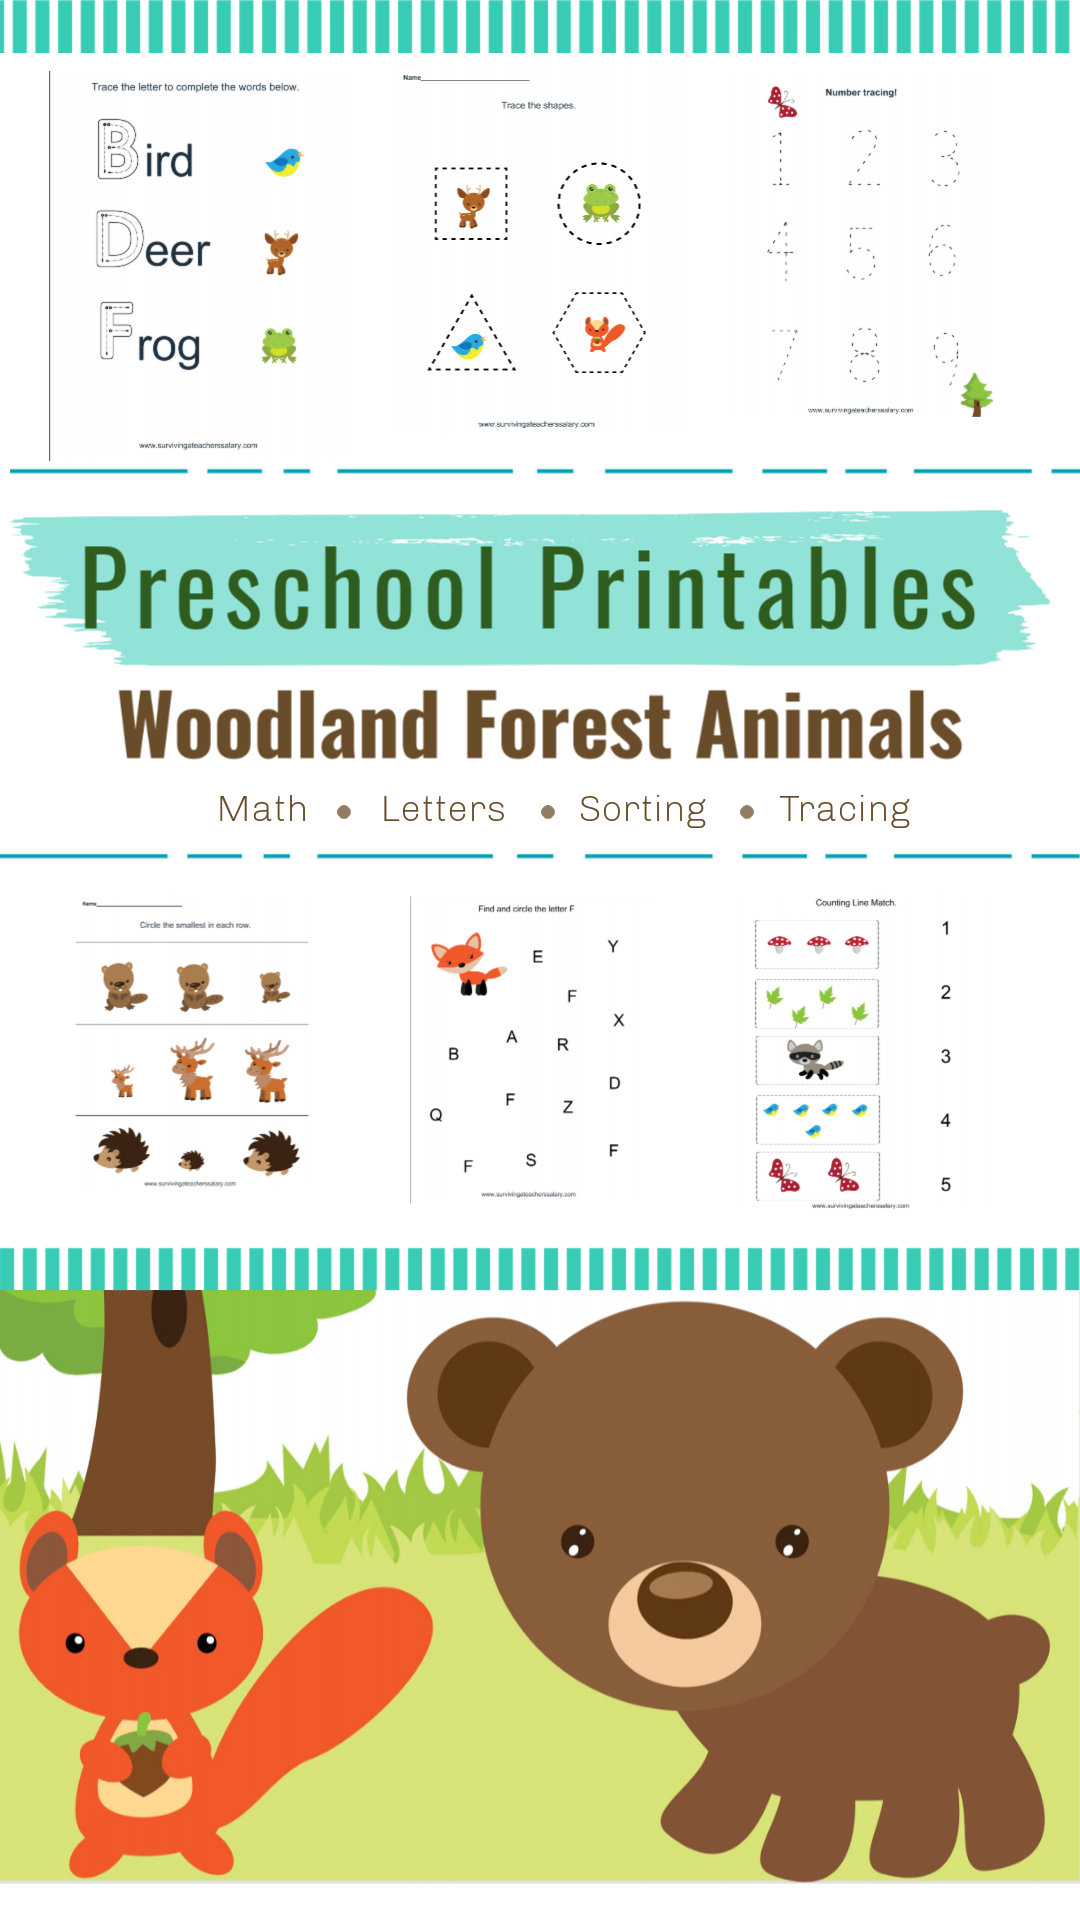 Woodlands Forest Friends Printable Preschool Set In